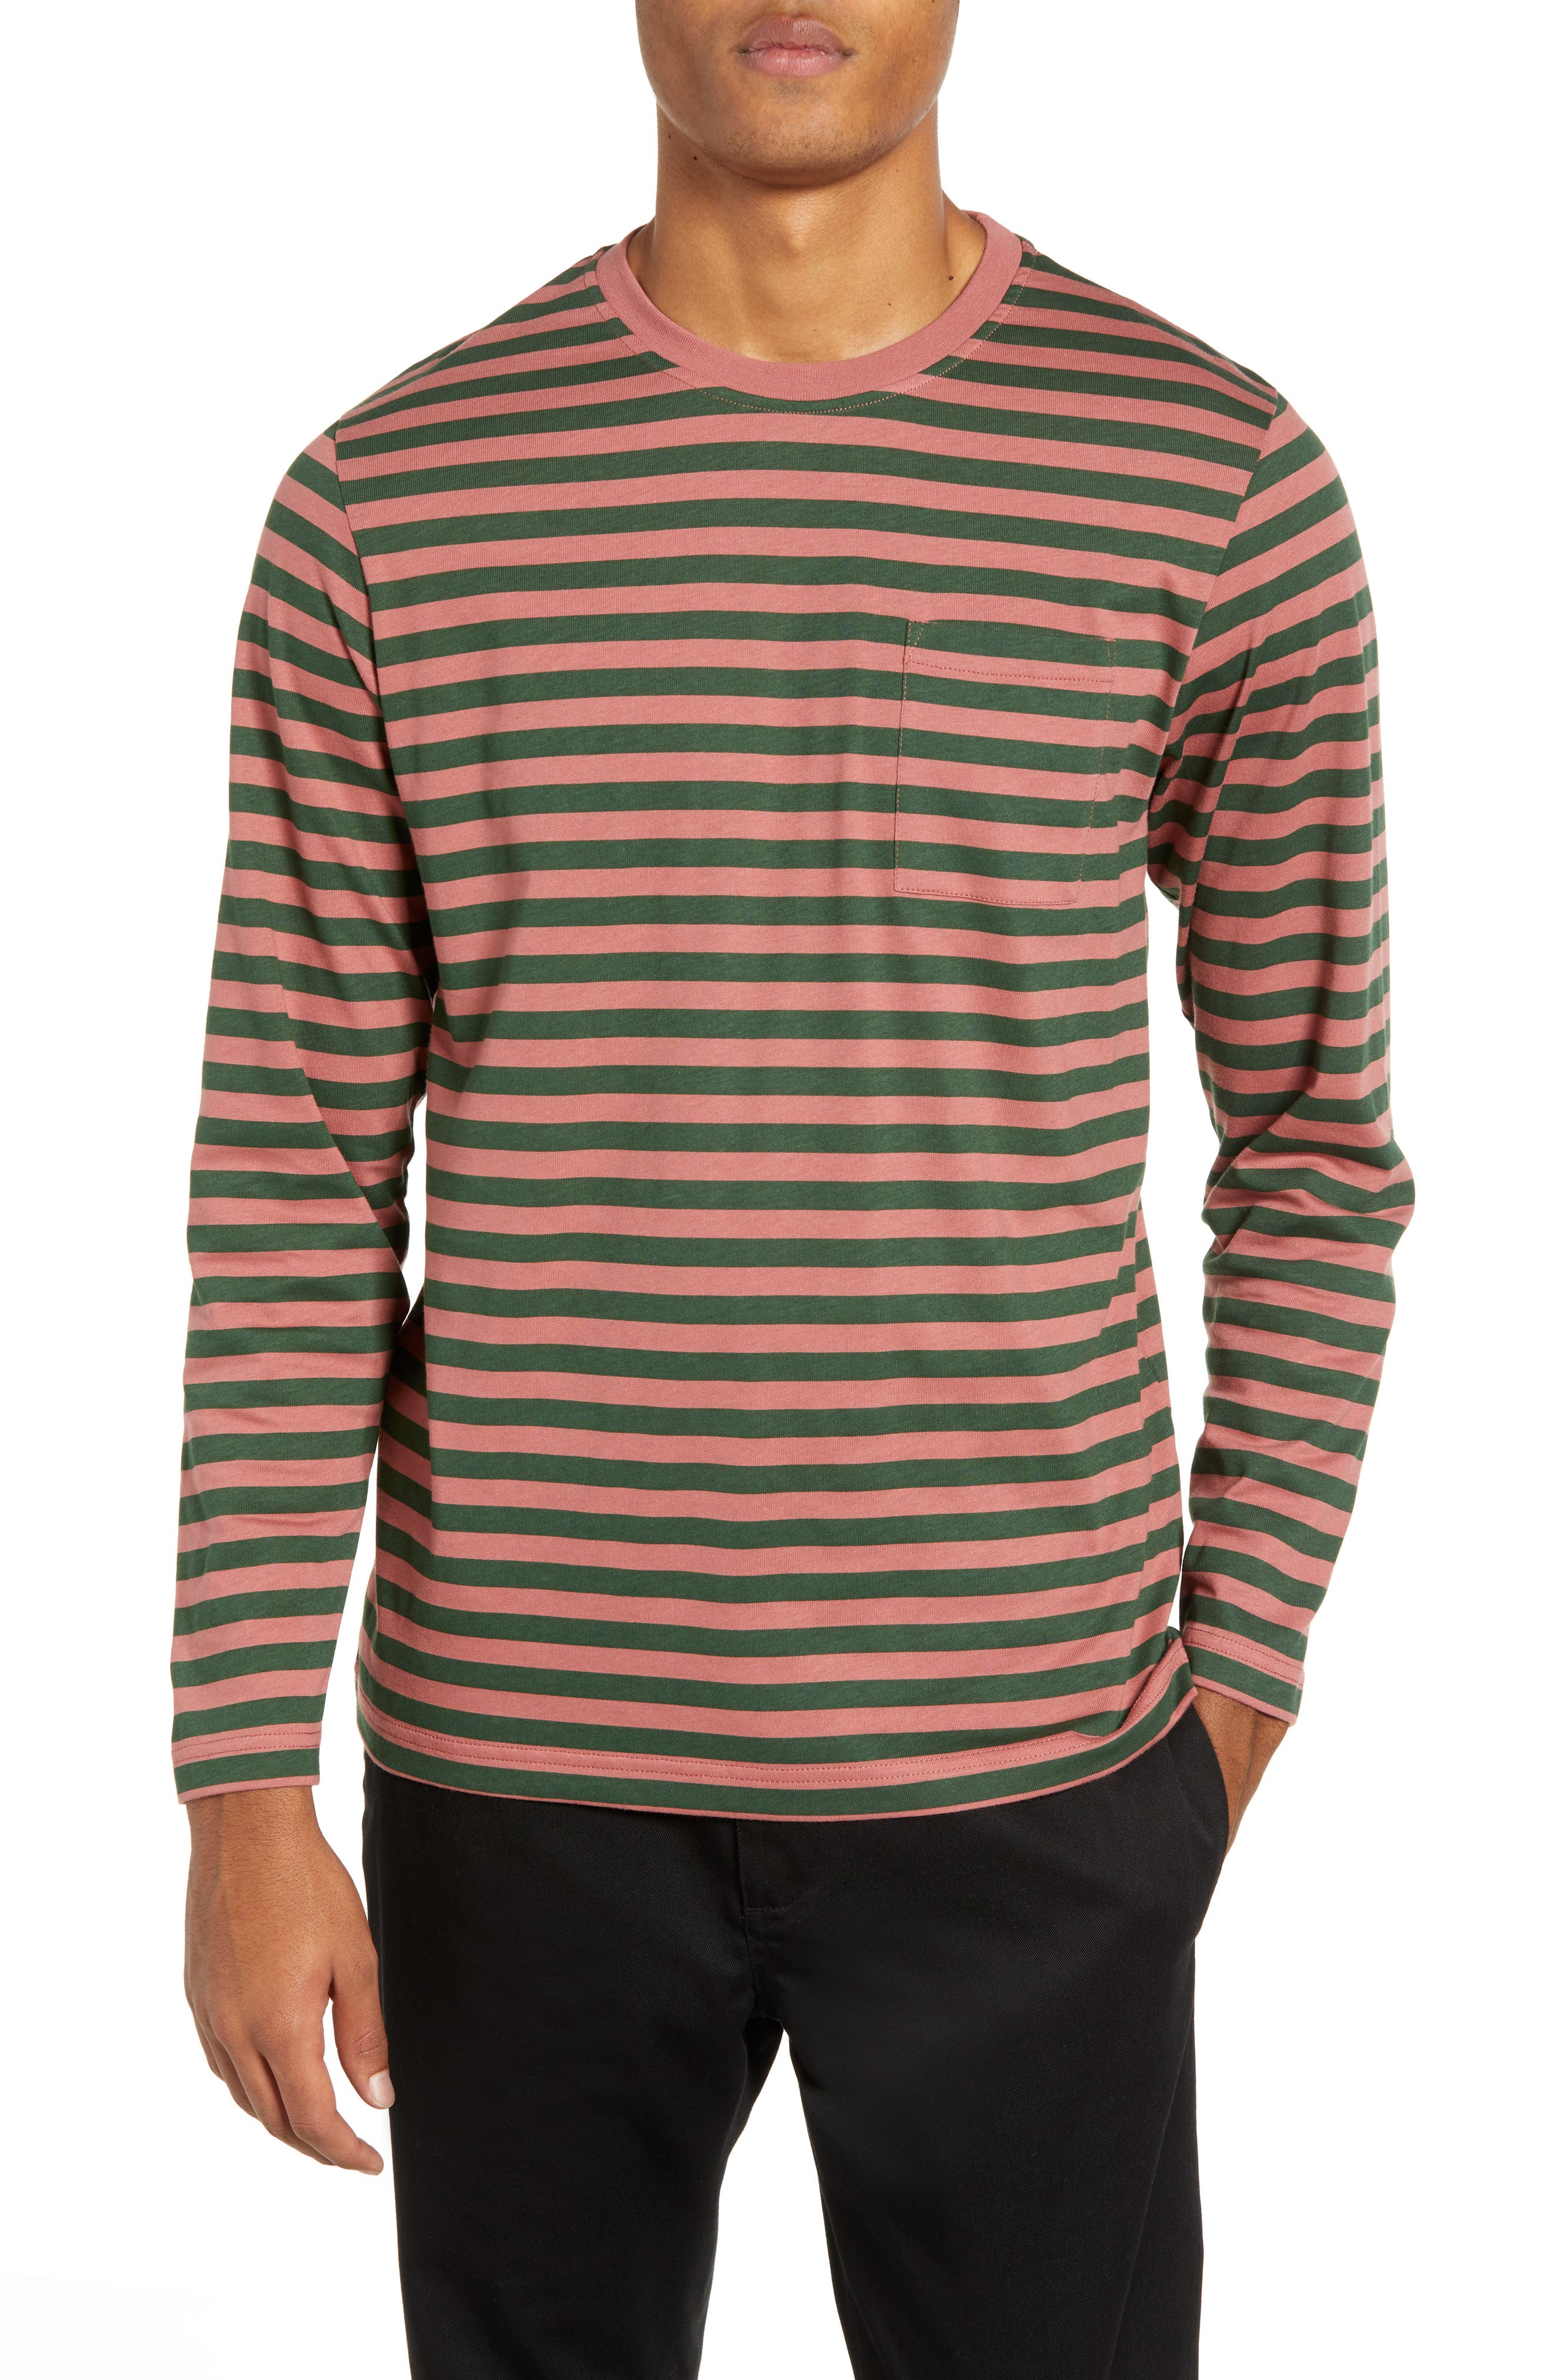 Wesc Makai Stripe Long Sleeve Pocket T-Shirt, Pink